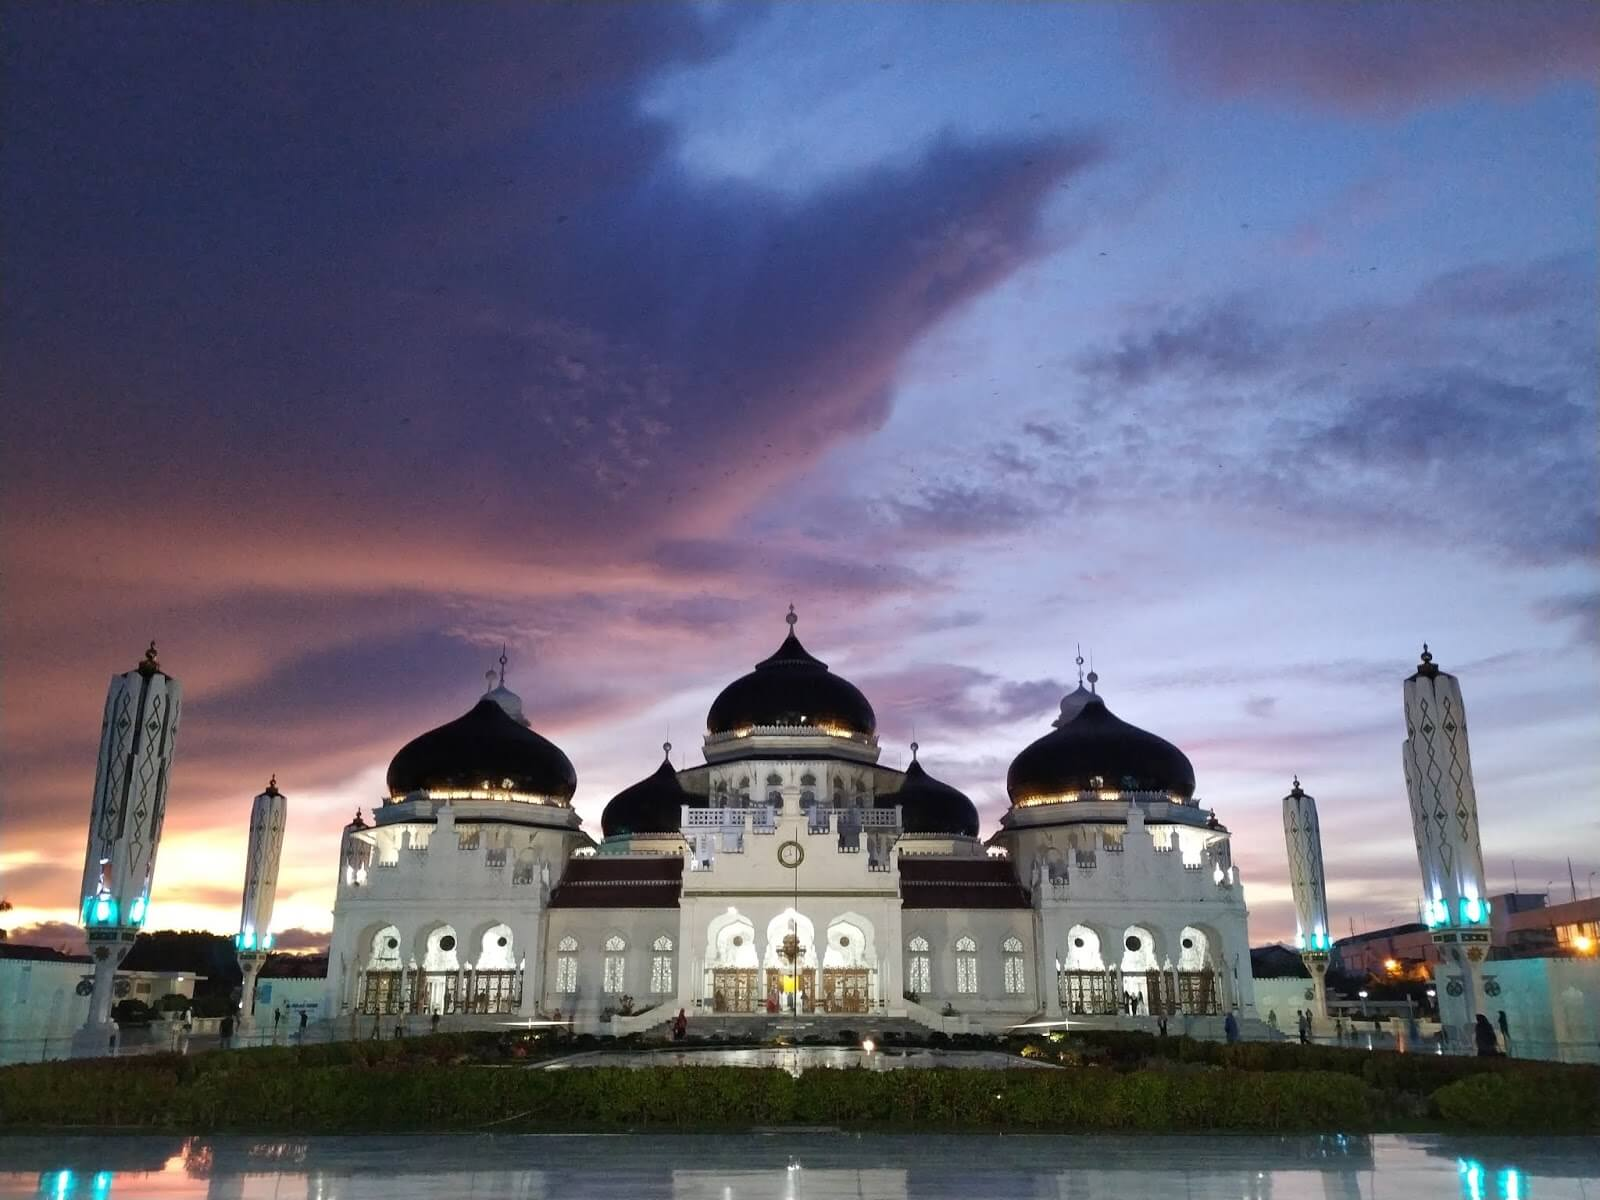 Masjid Raya Baiturrahman - Geliat Pariwisata Aceh yang Ambyar Diterjang Tsunami 15 Tahun Silam